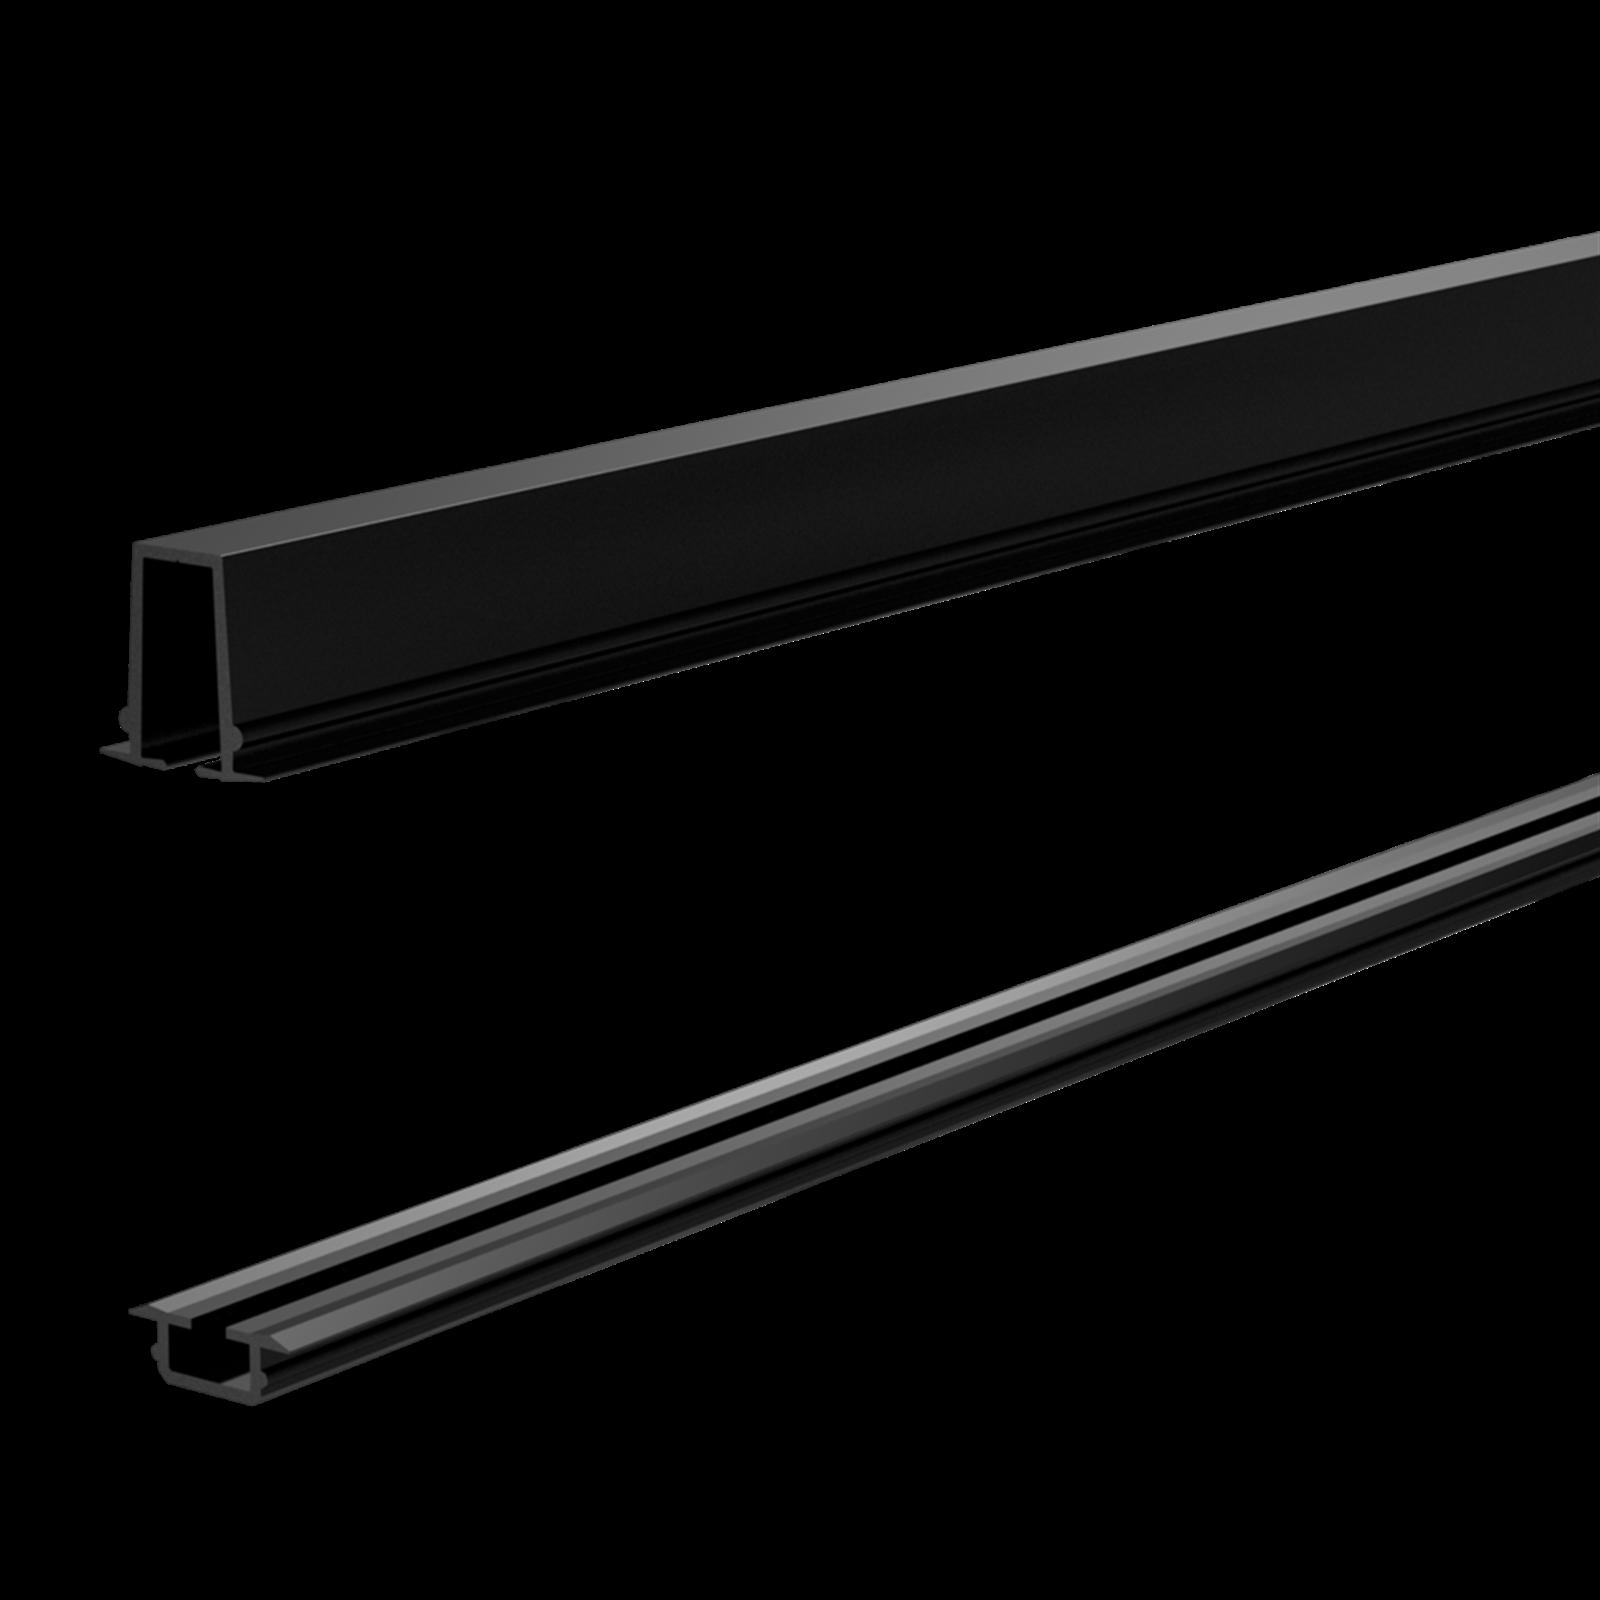 Peak Products 1200m Black Aluminium Balustrade Glass Gasket